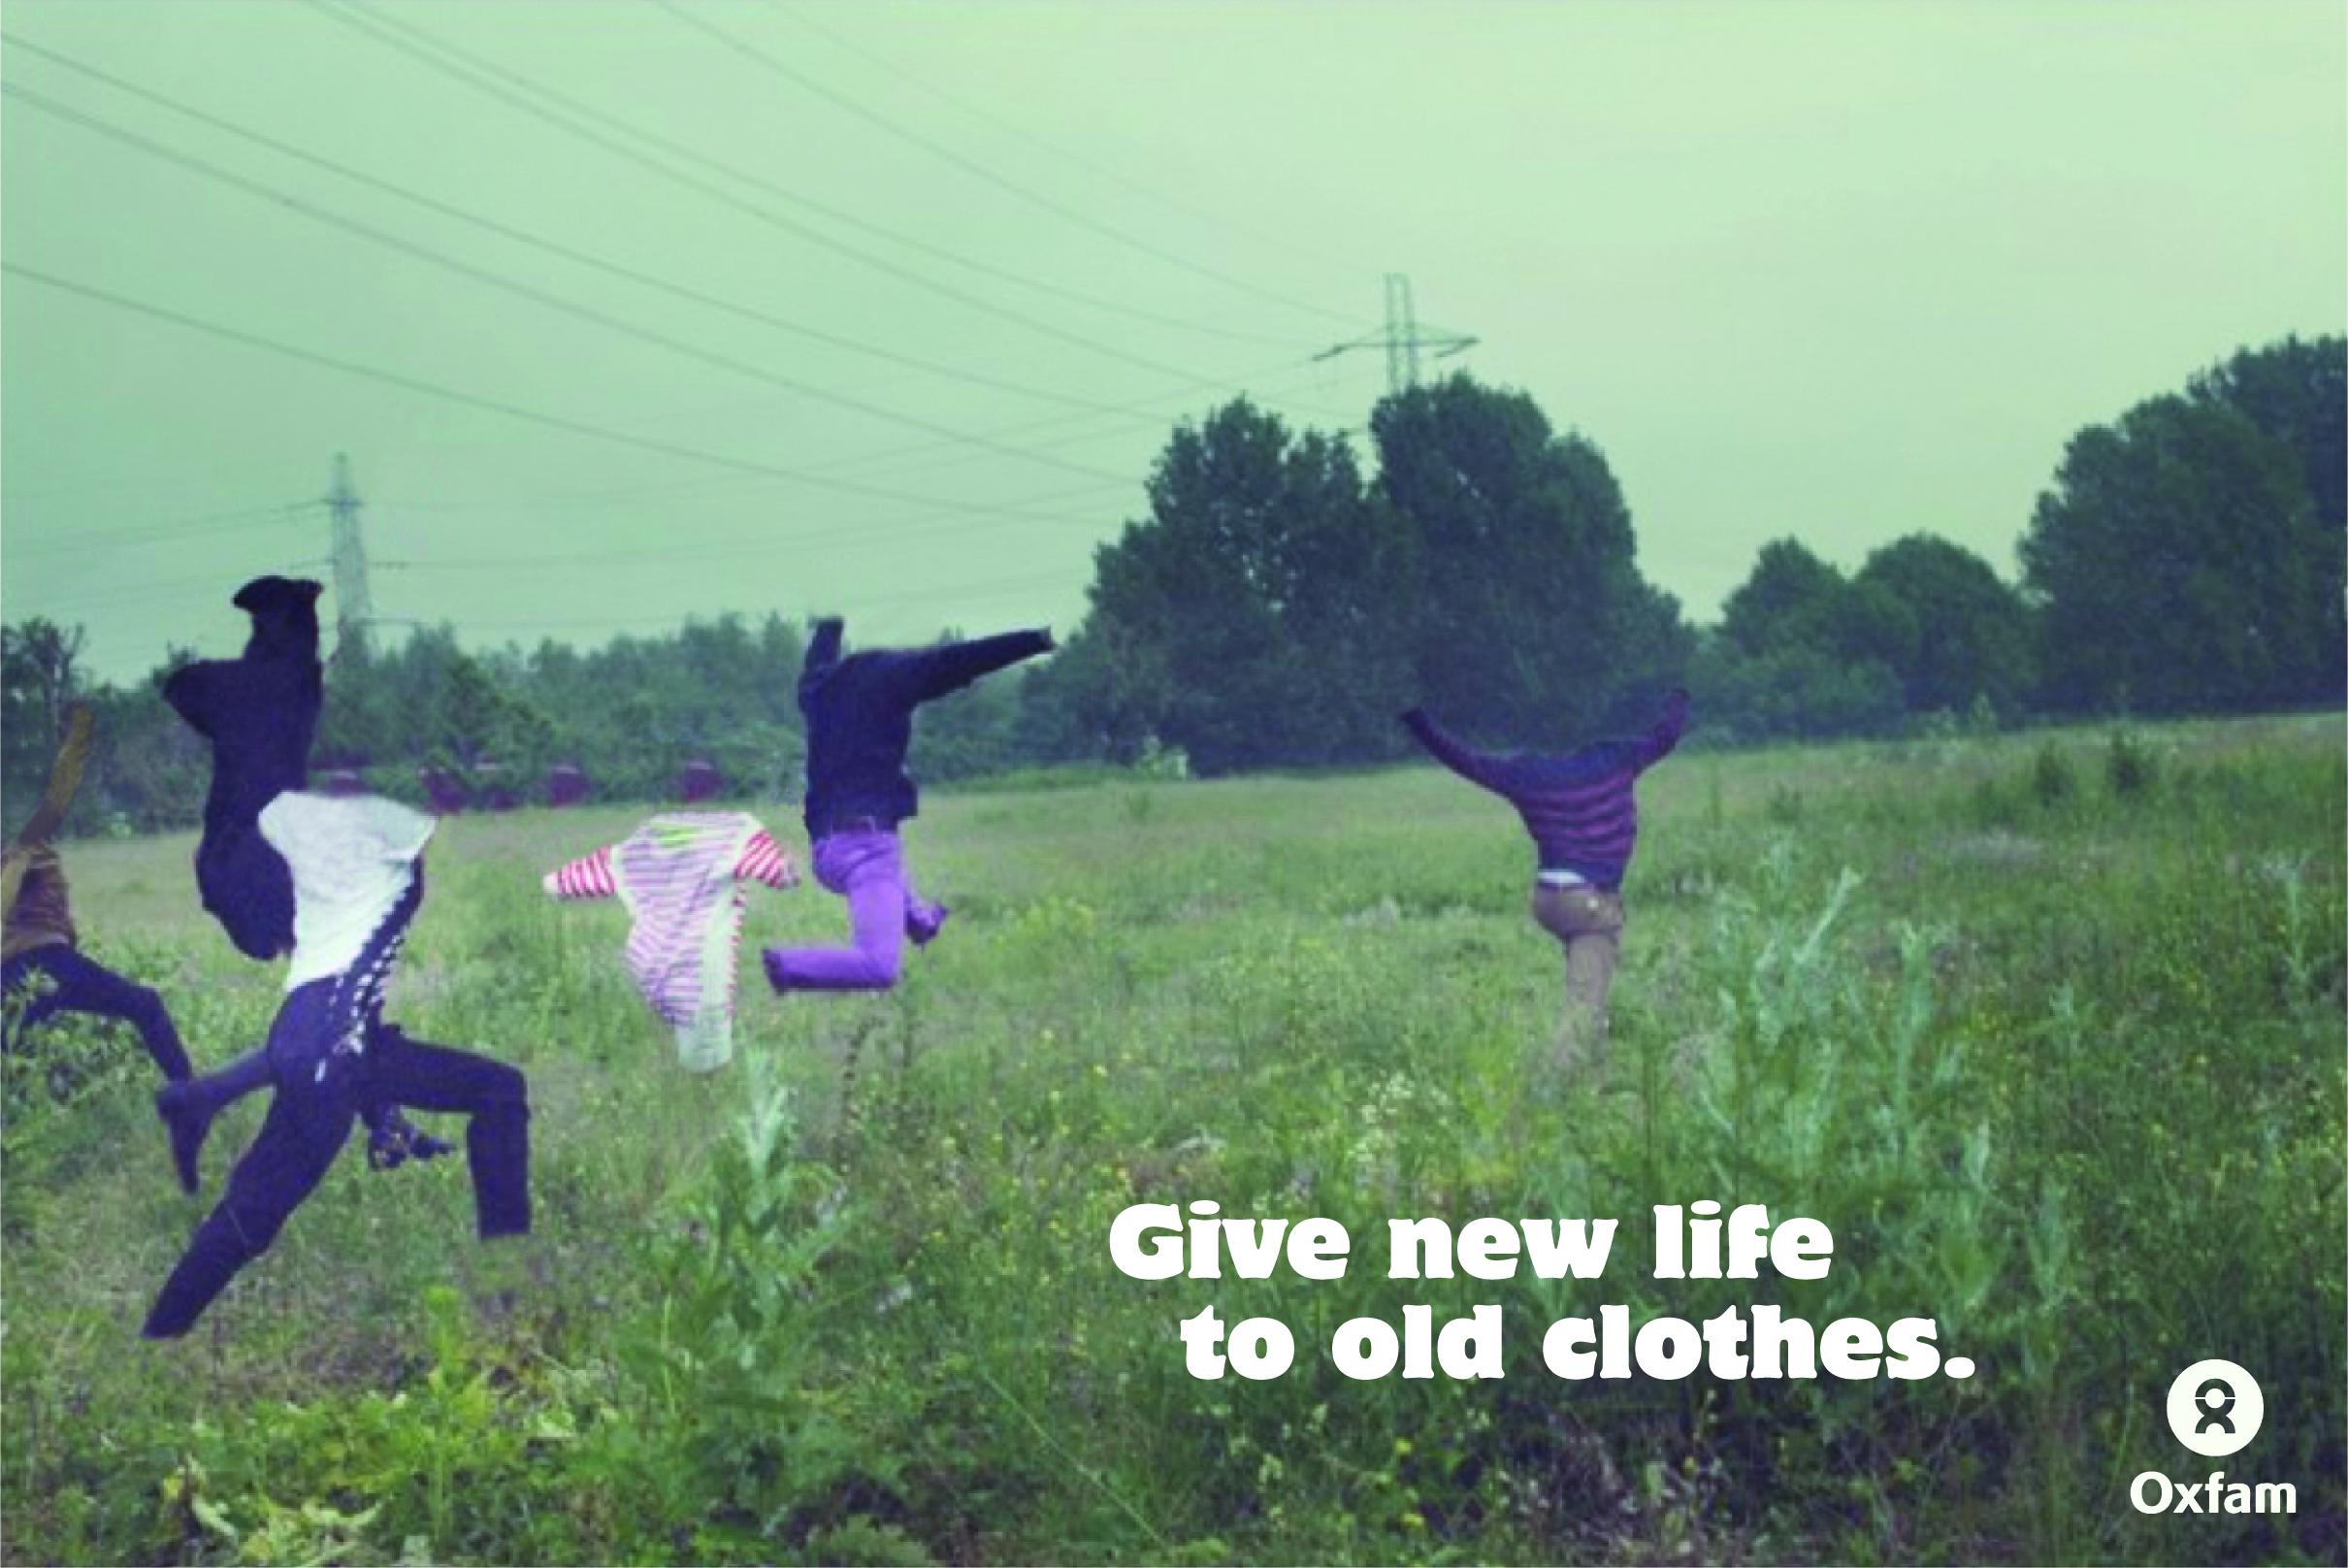 Oxfam Clothes.jpg